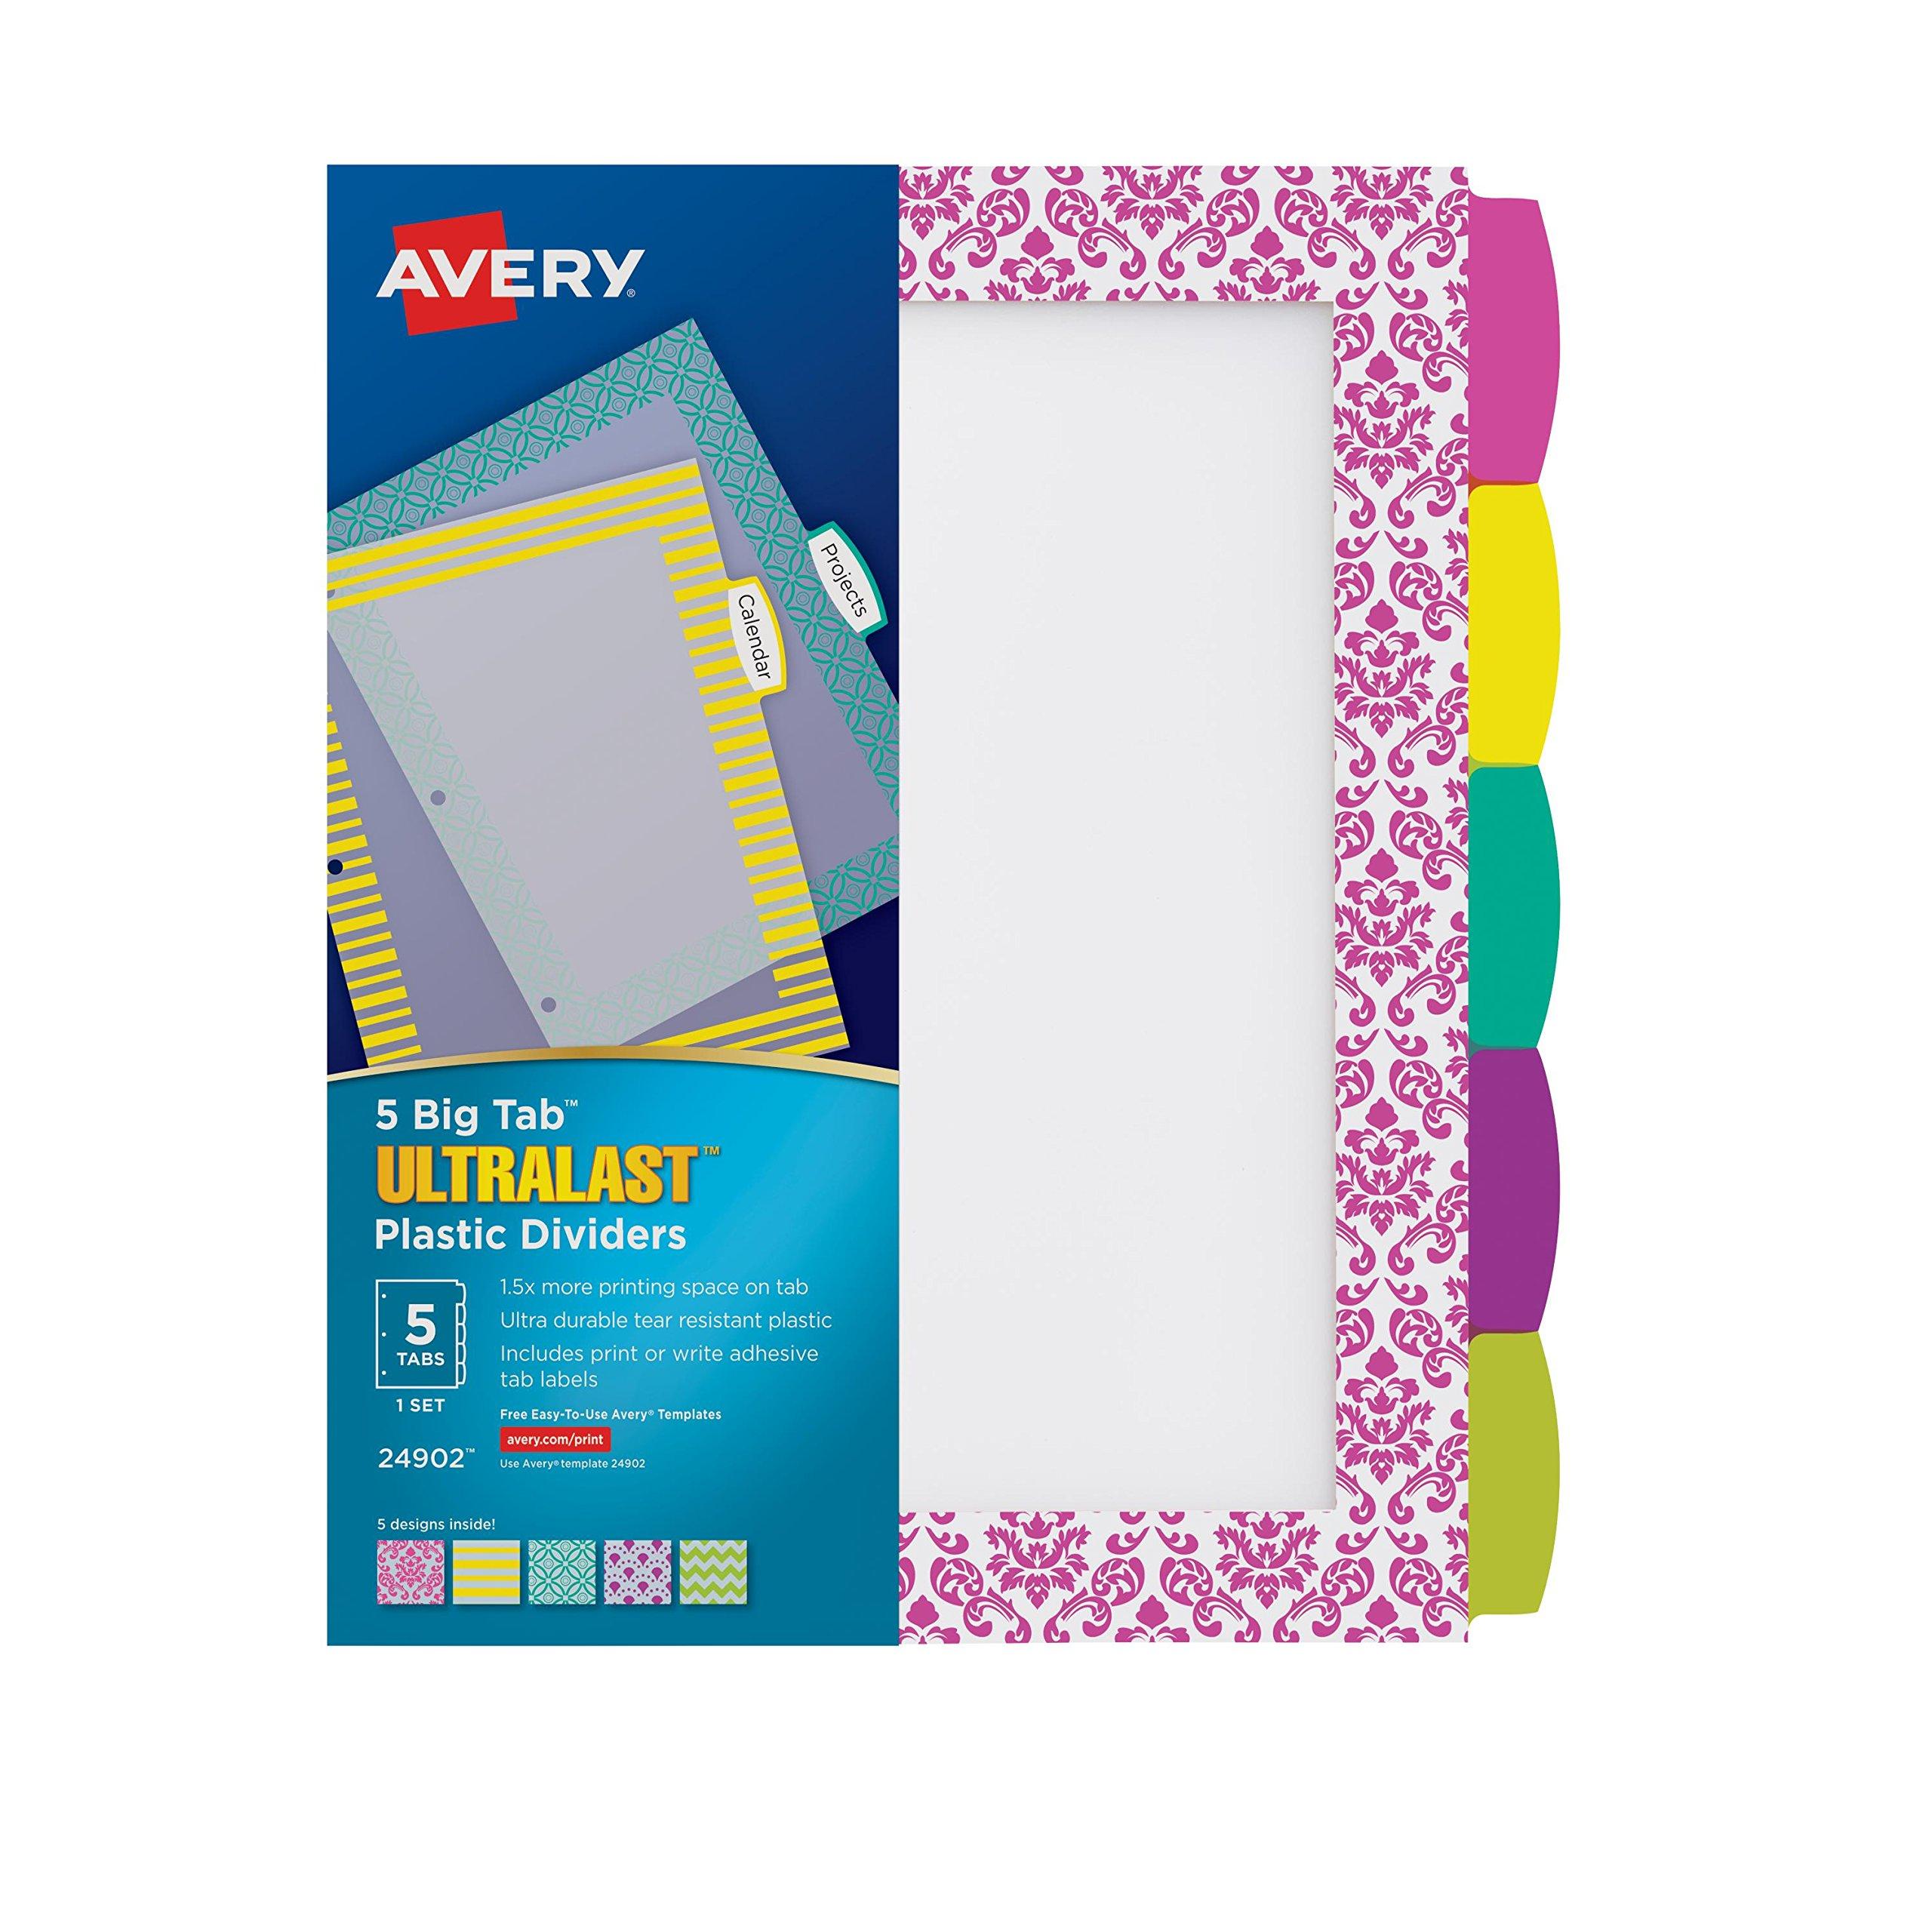 Avery Ultralast Big Tab Plastic Dividers, 5 Tabs, 1 Set, Assorted Designs (24902)